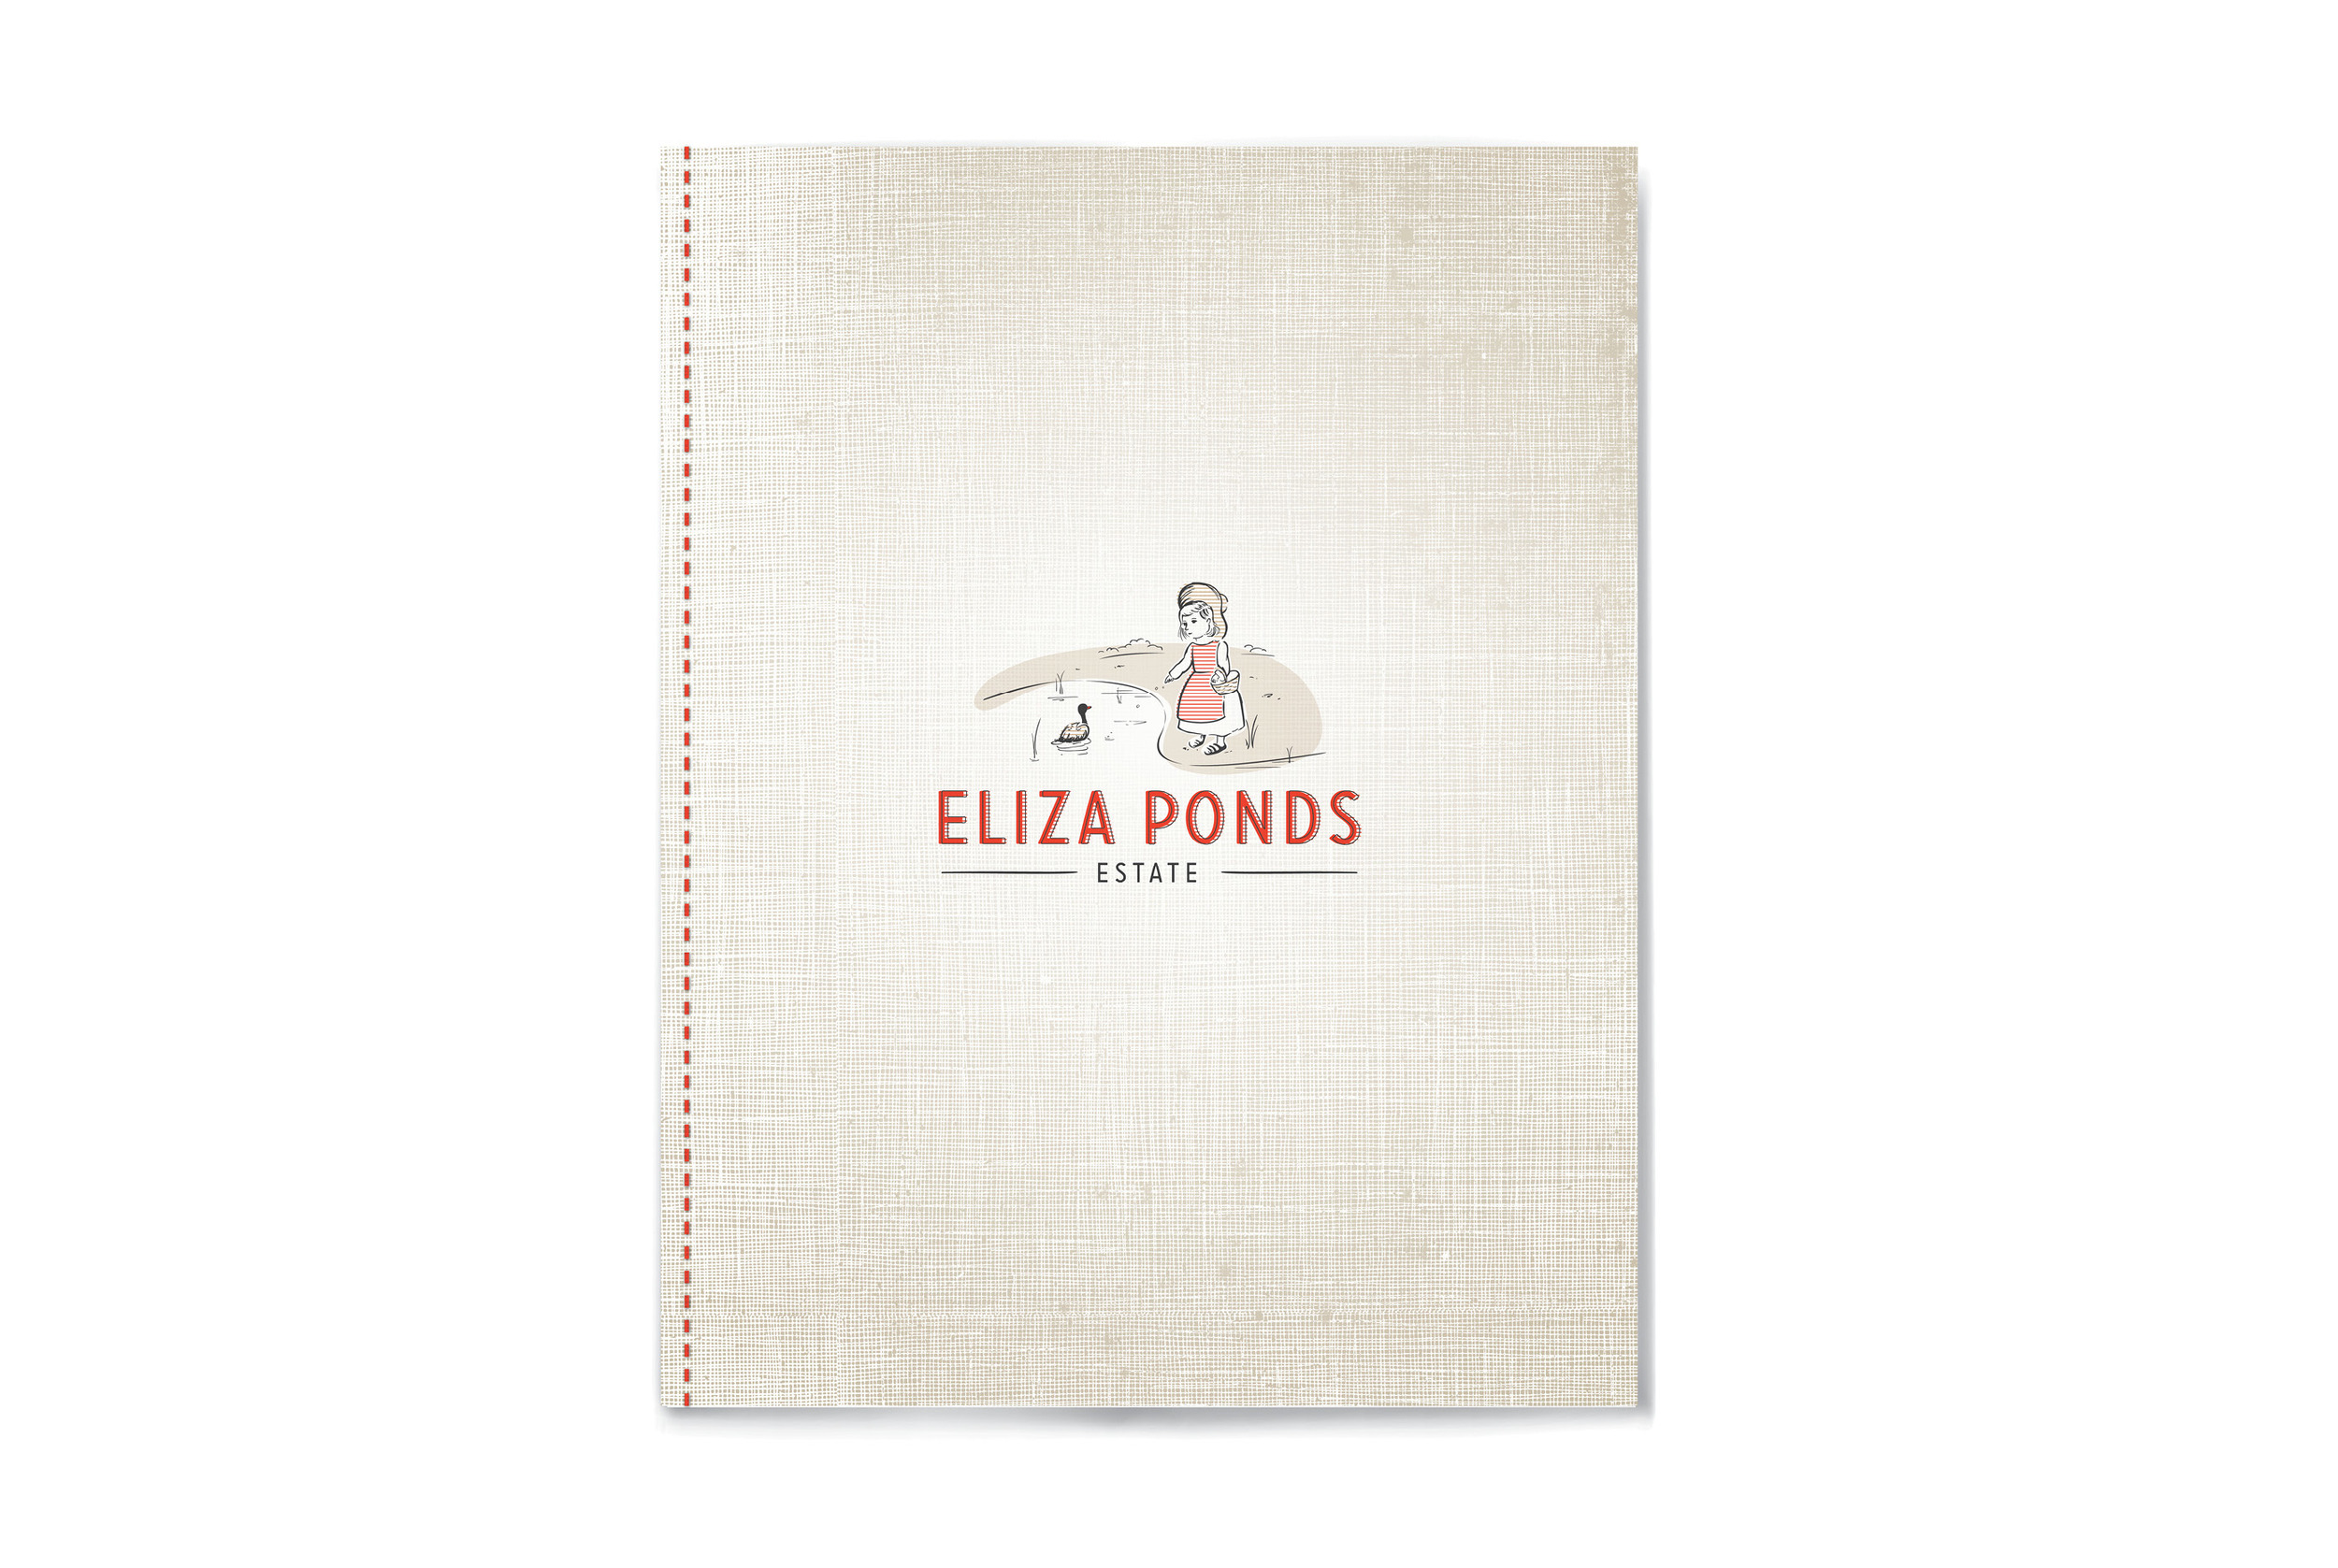 Eliza Ponds03.jpg